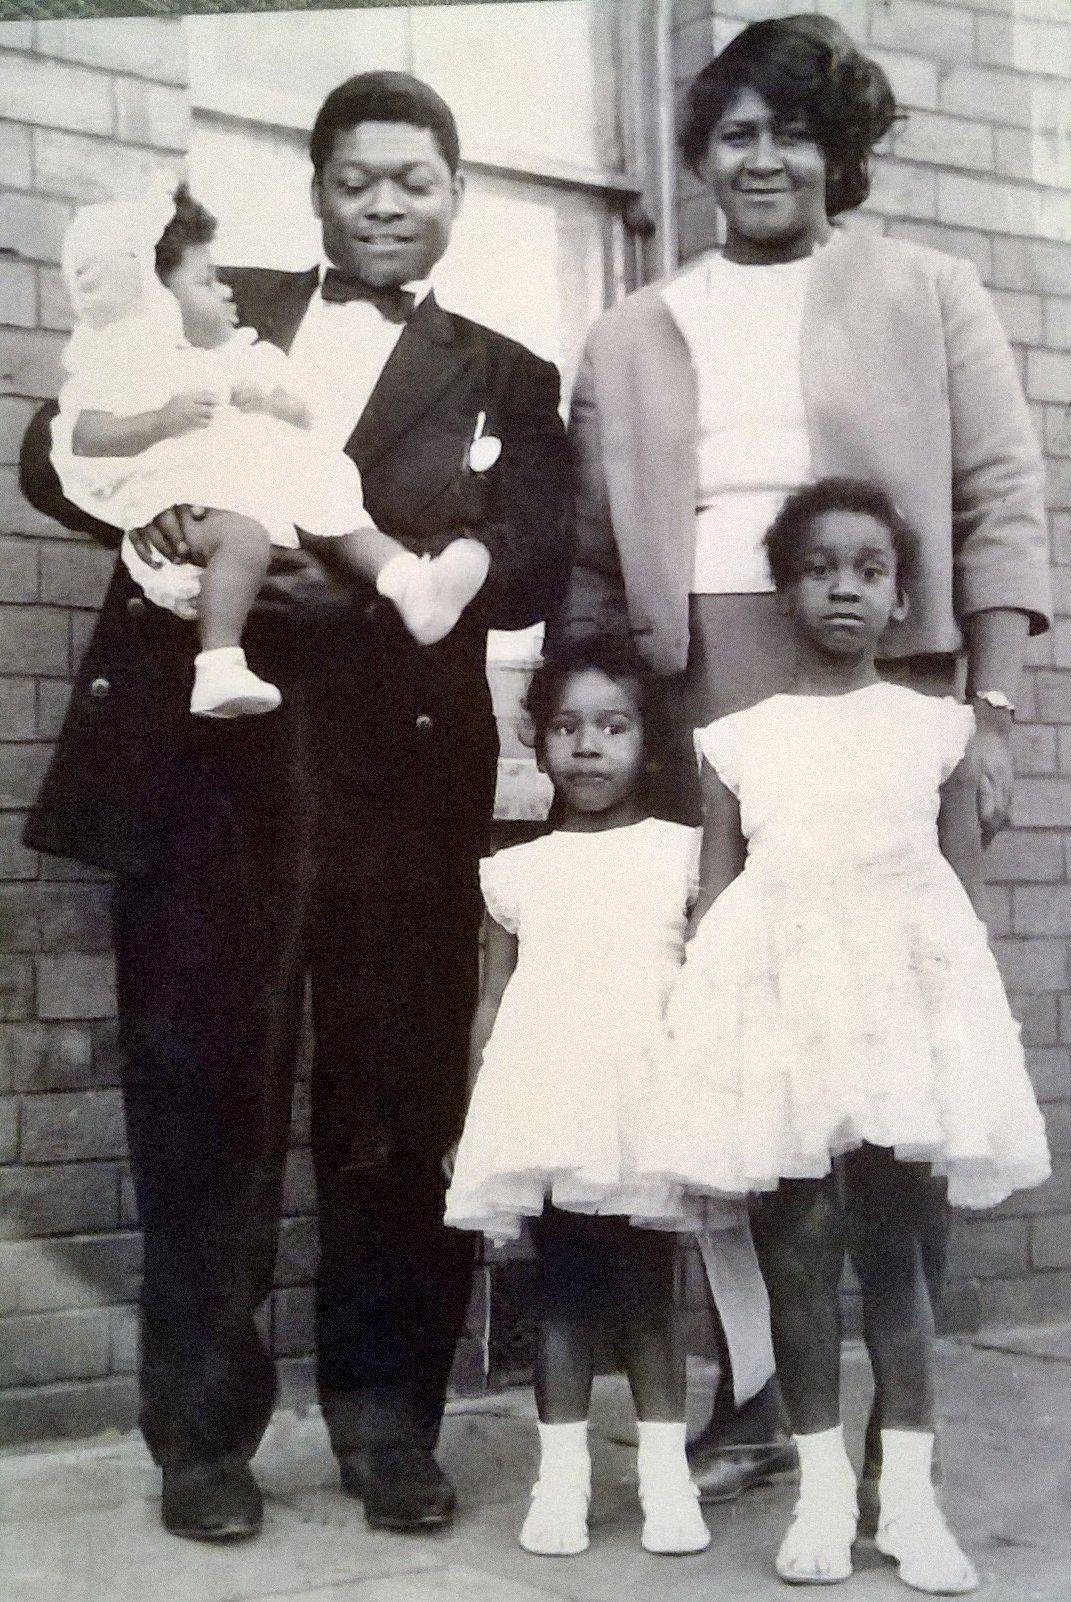 Grandma In Creole : grandma, creole, Grandparents, Mixed, Jamaican, Creole, Indian., Blasian., Sisters, Children., 6/6…, Family,, Infancy,, Jamaicans